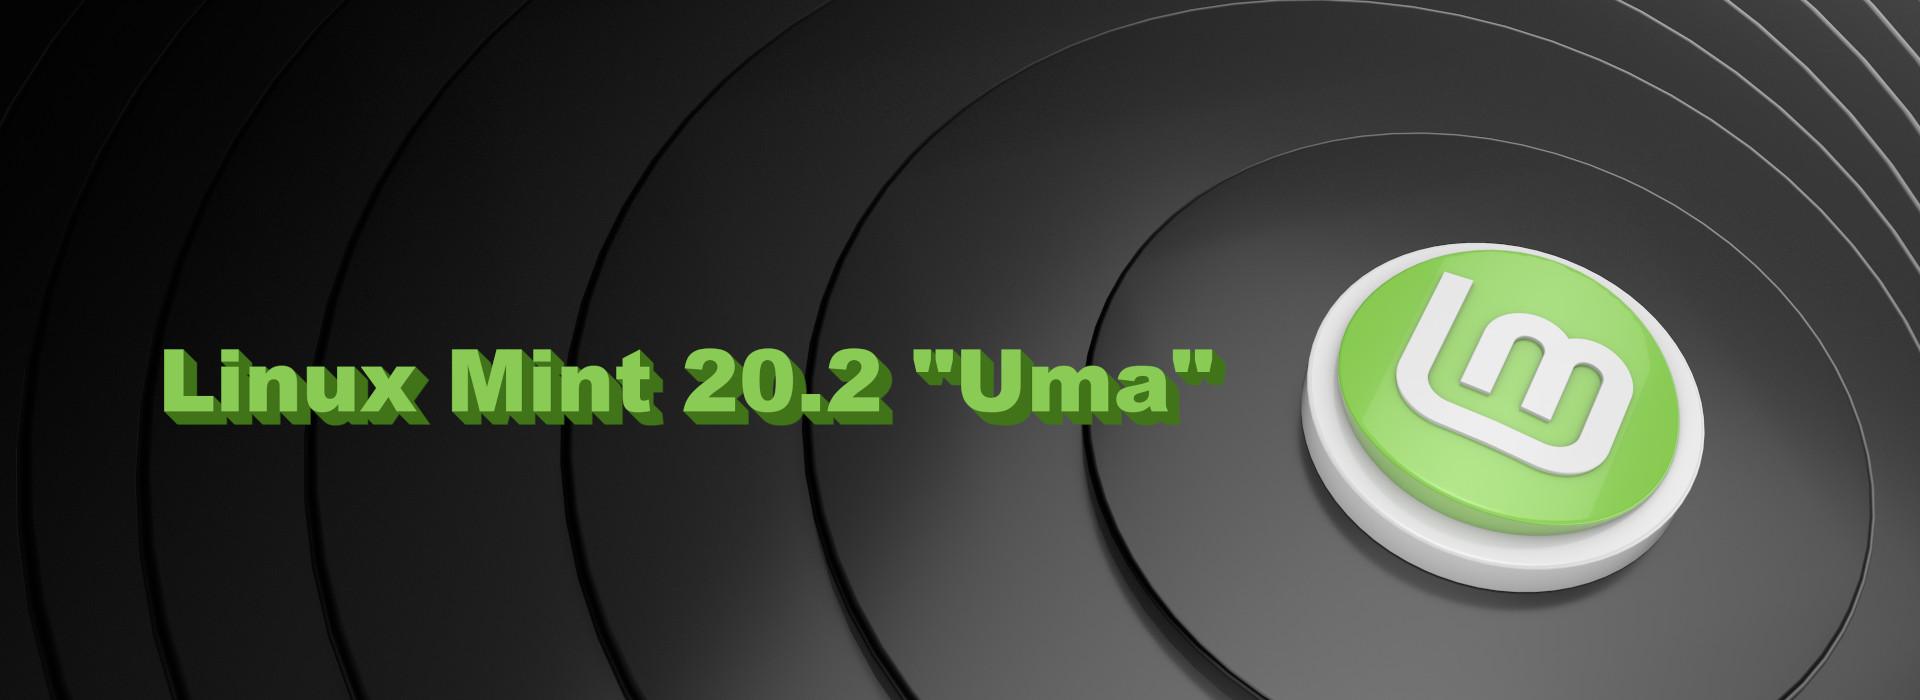 Linux Mint 20.2 uscita a giugno (copertina)